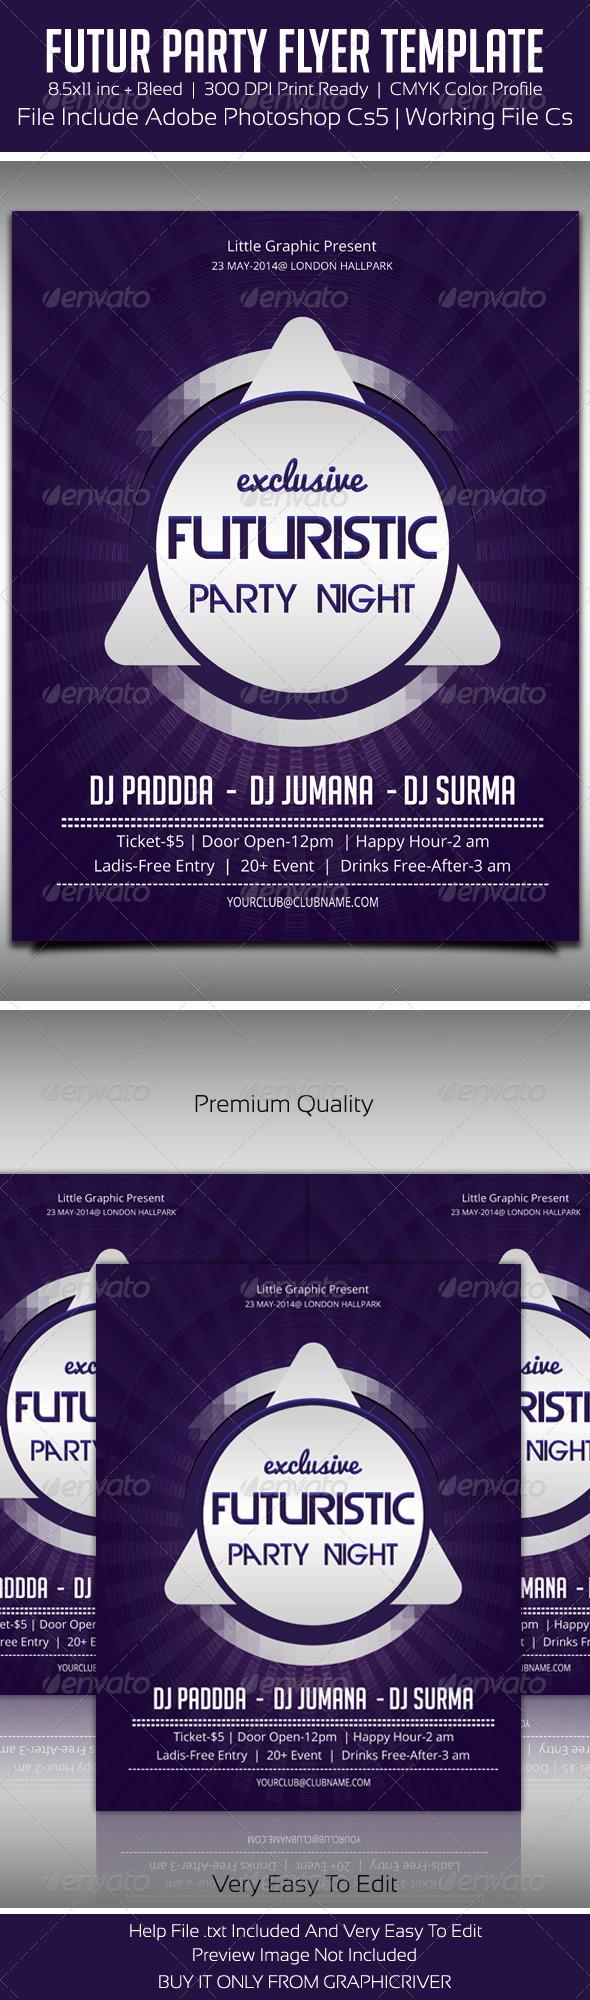 Future Party Flyer 5 - Flyers Print Templates